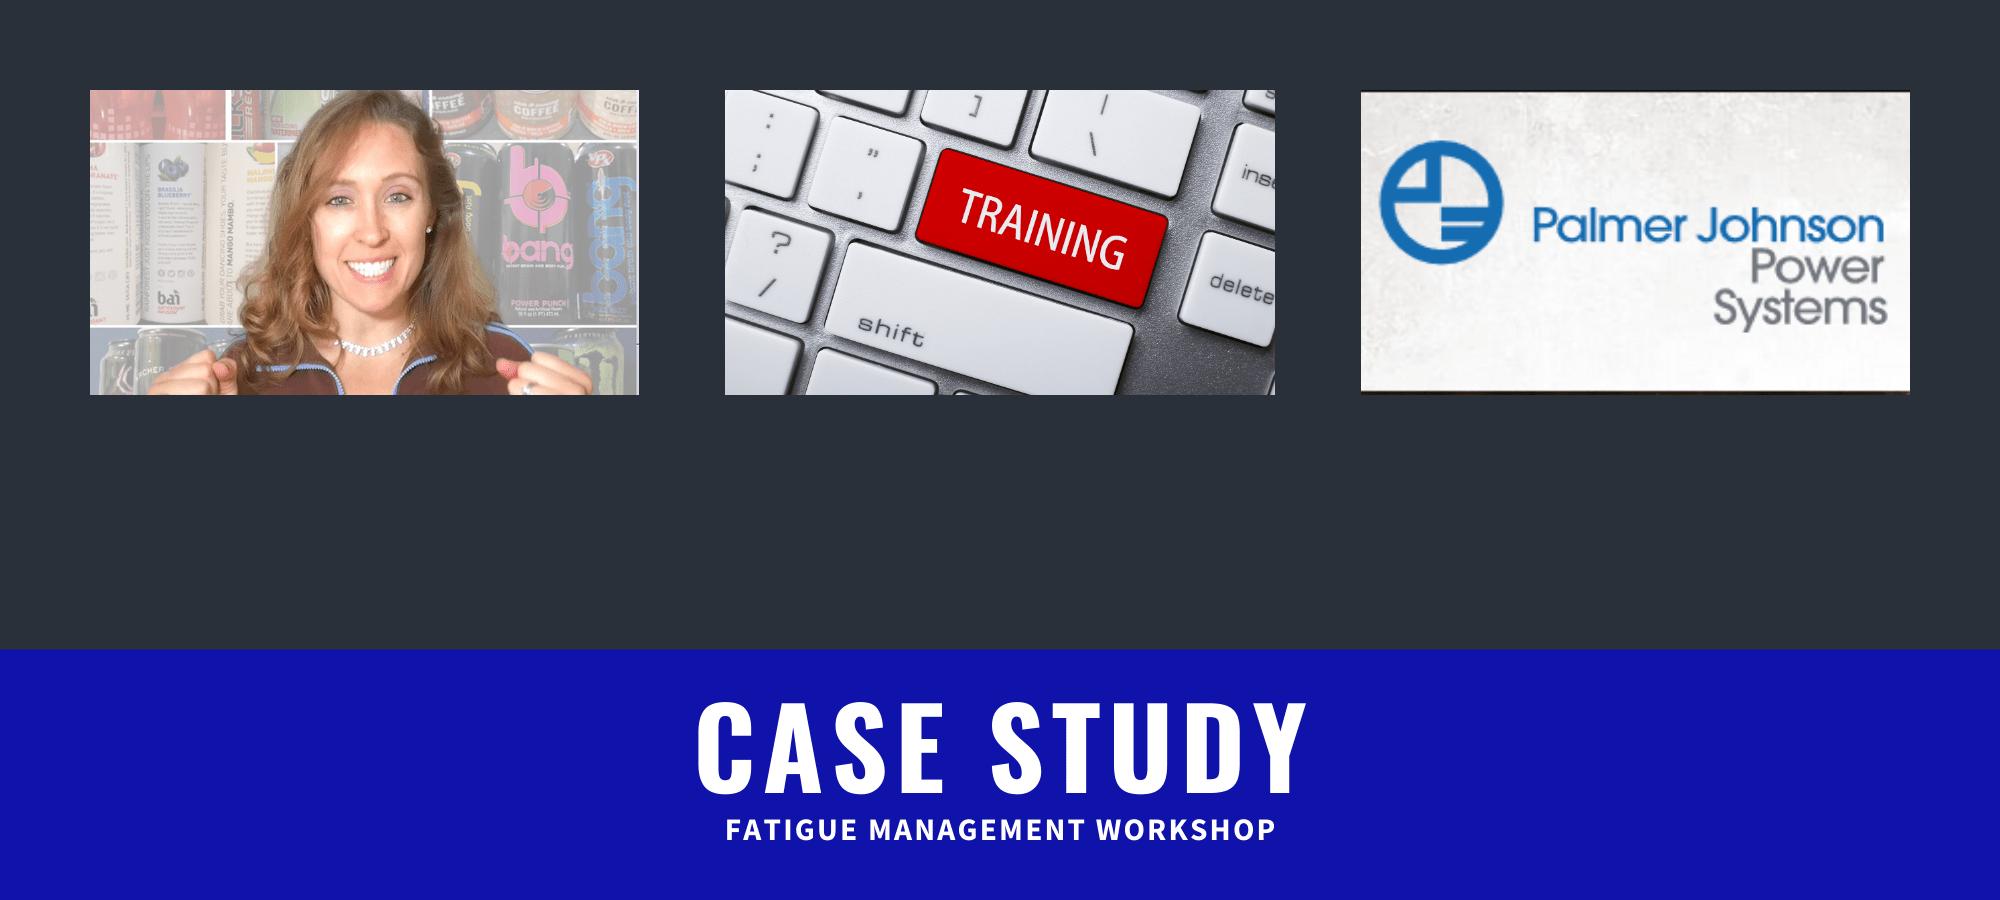 Case Study GEG Fatigue Training WP Cover